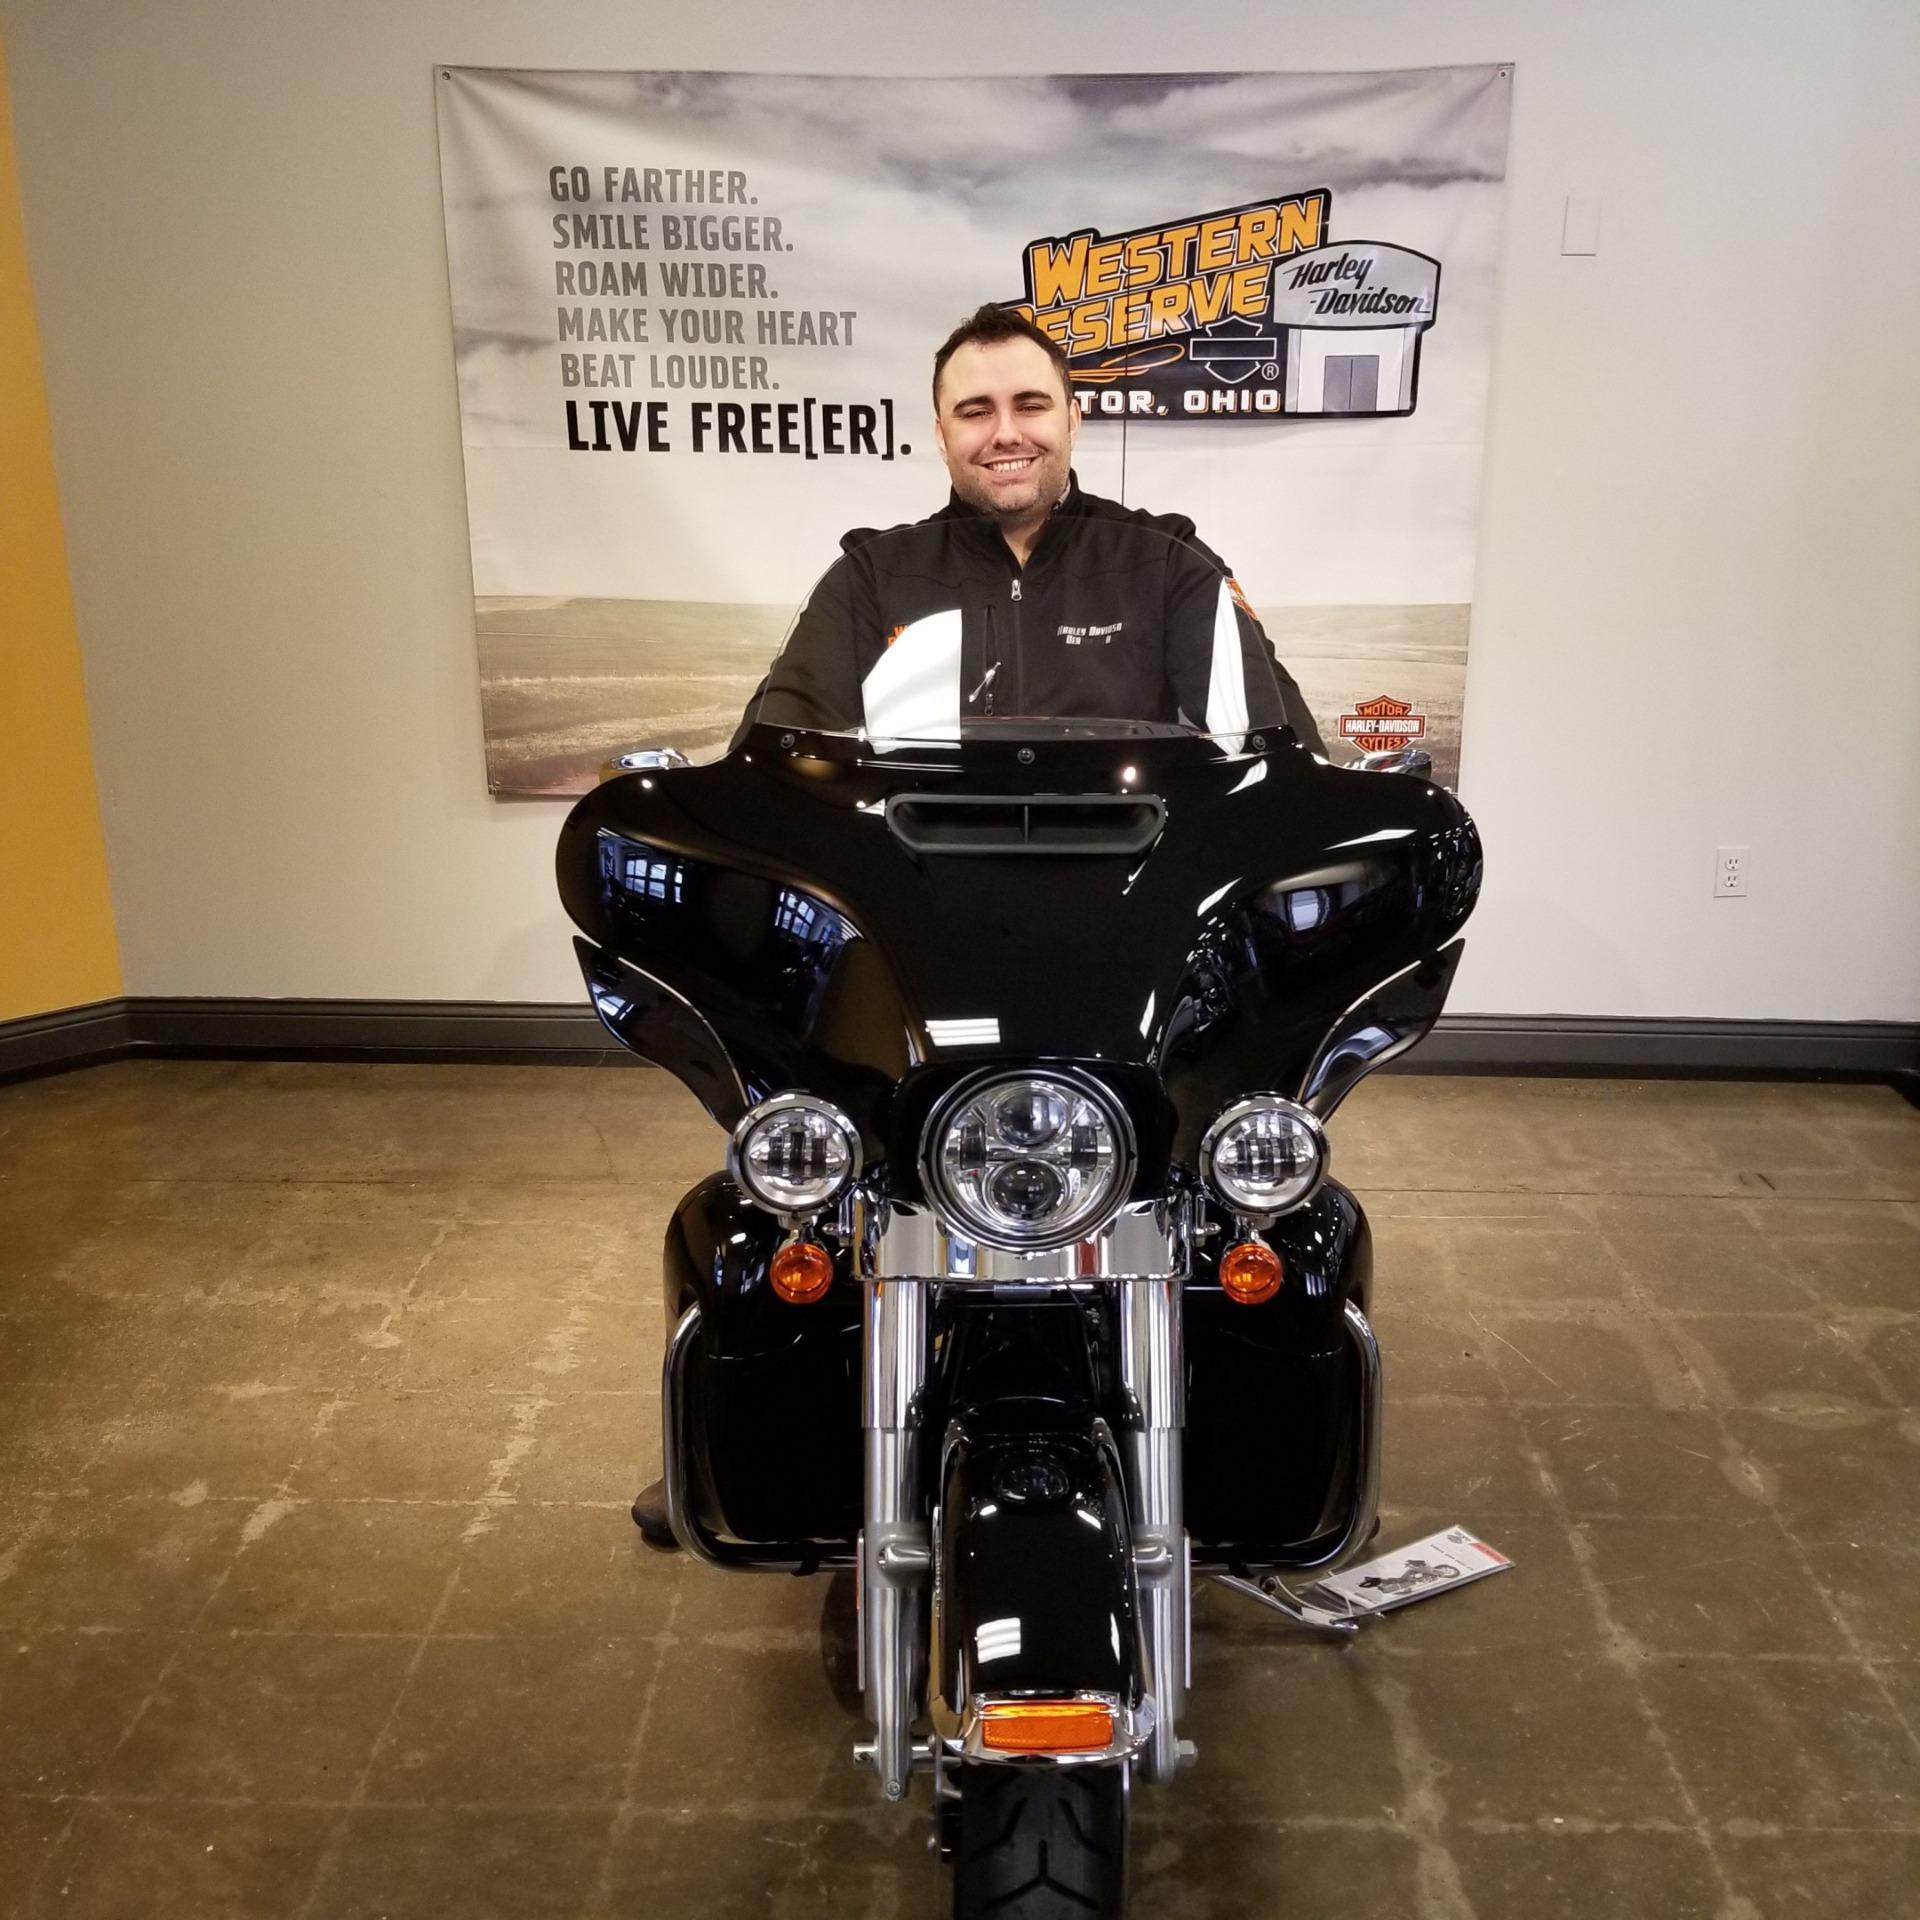 2019 Harley-Davidson Street Glide Special 12